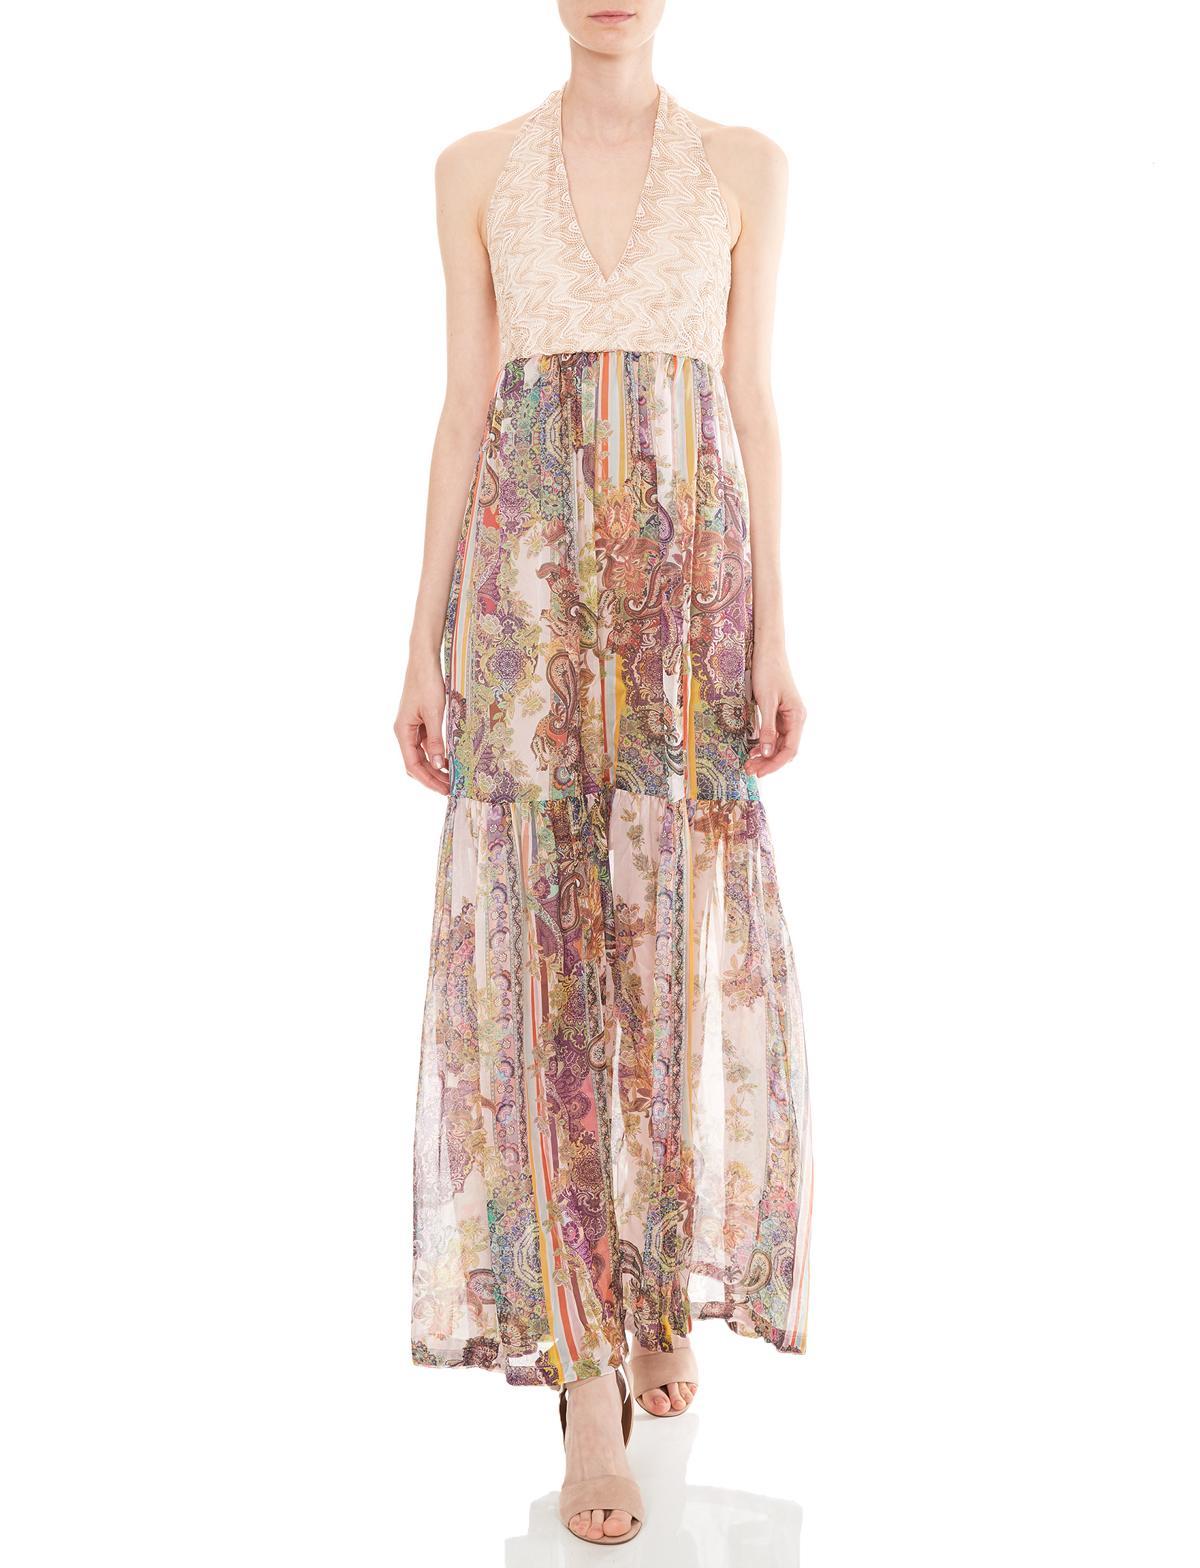 11489889125 Front of Ana Alcazar Maxi Dress Madalyn worn by model